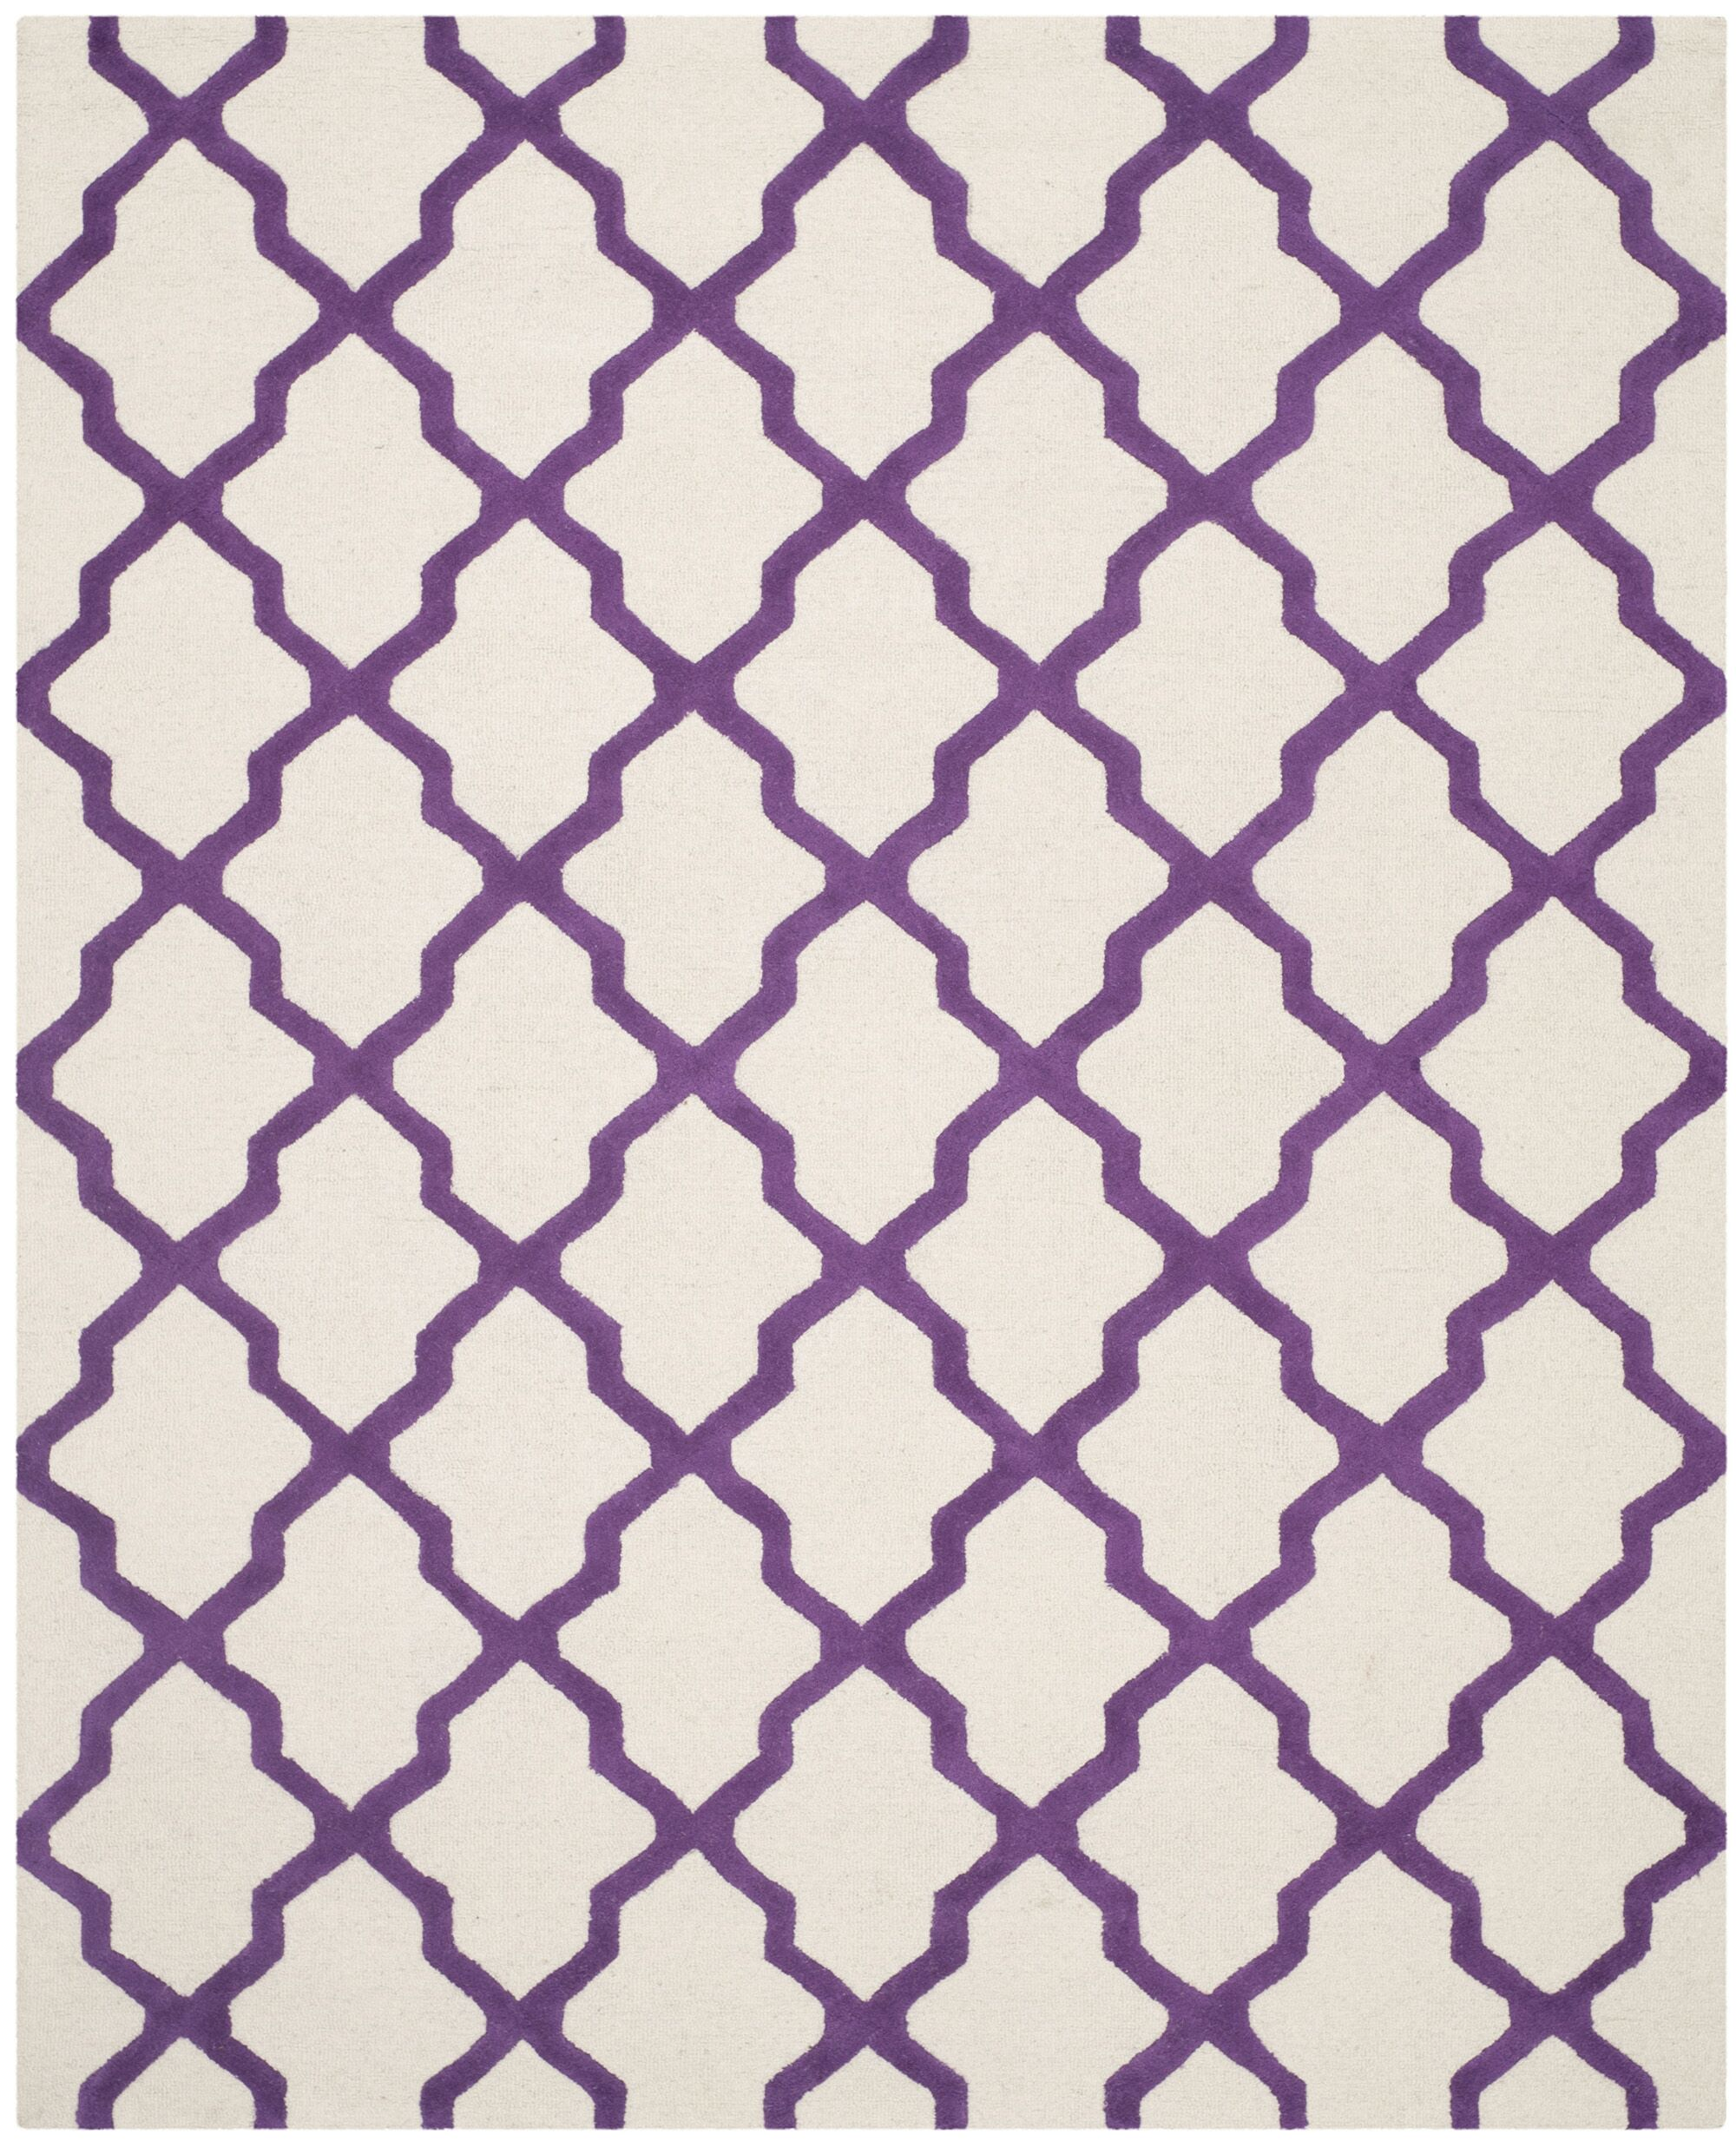 Charlenne Ivory / Purple Area Rug Rug Size: Rectangle 8' x 10'